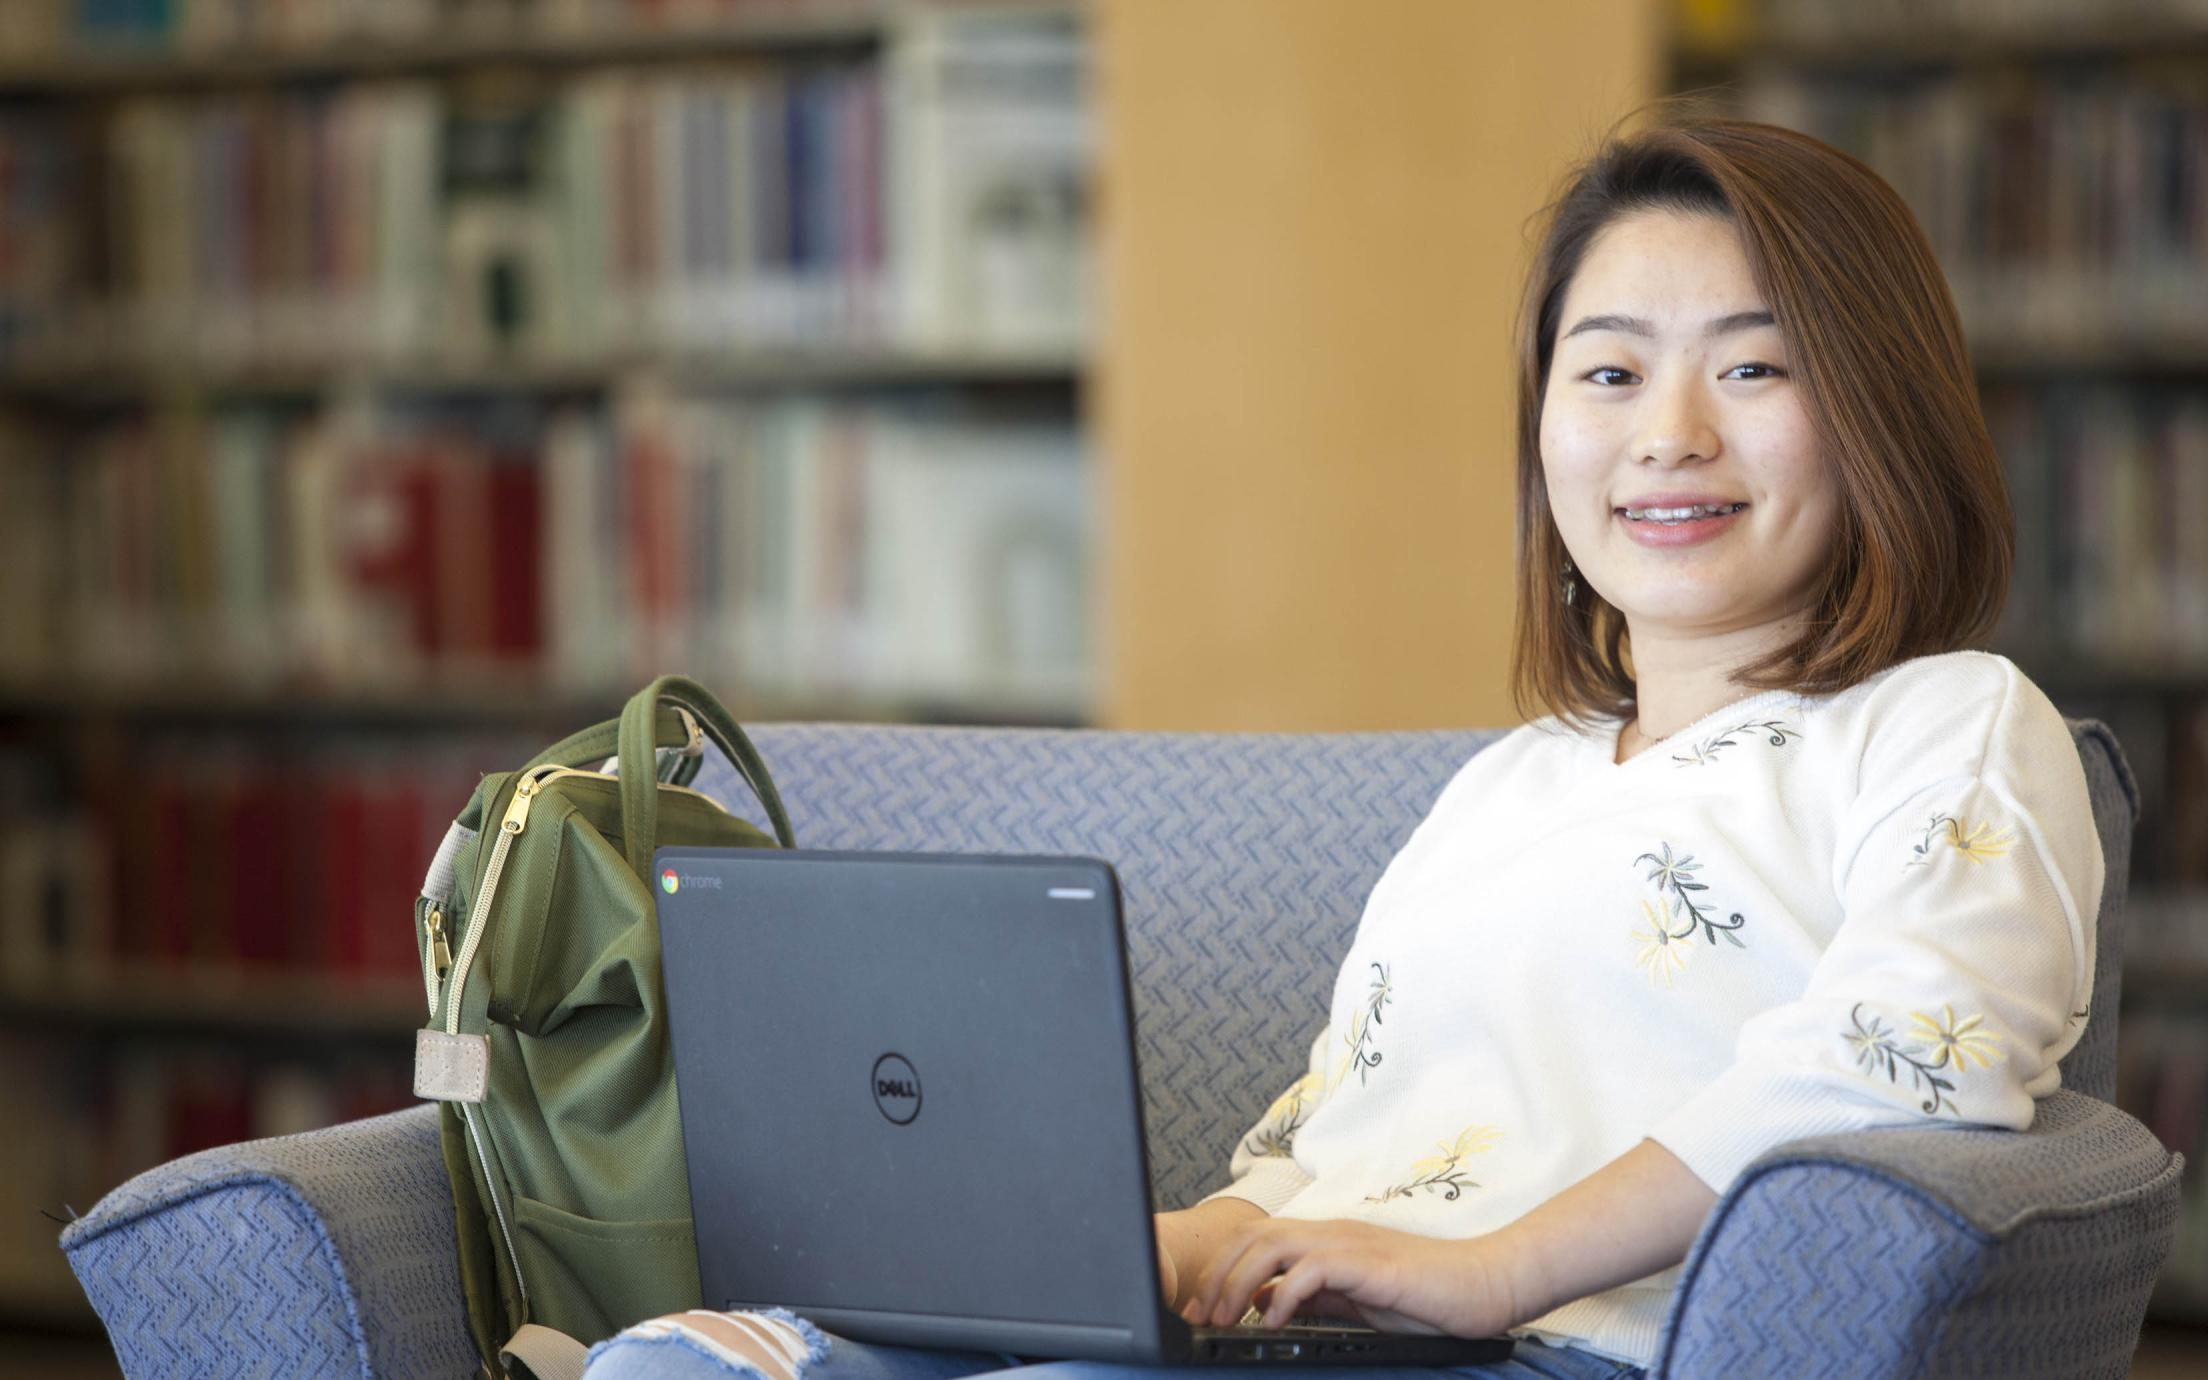 Bachelor of Arts, Minor in Digital Media